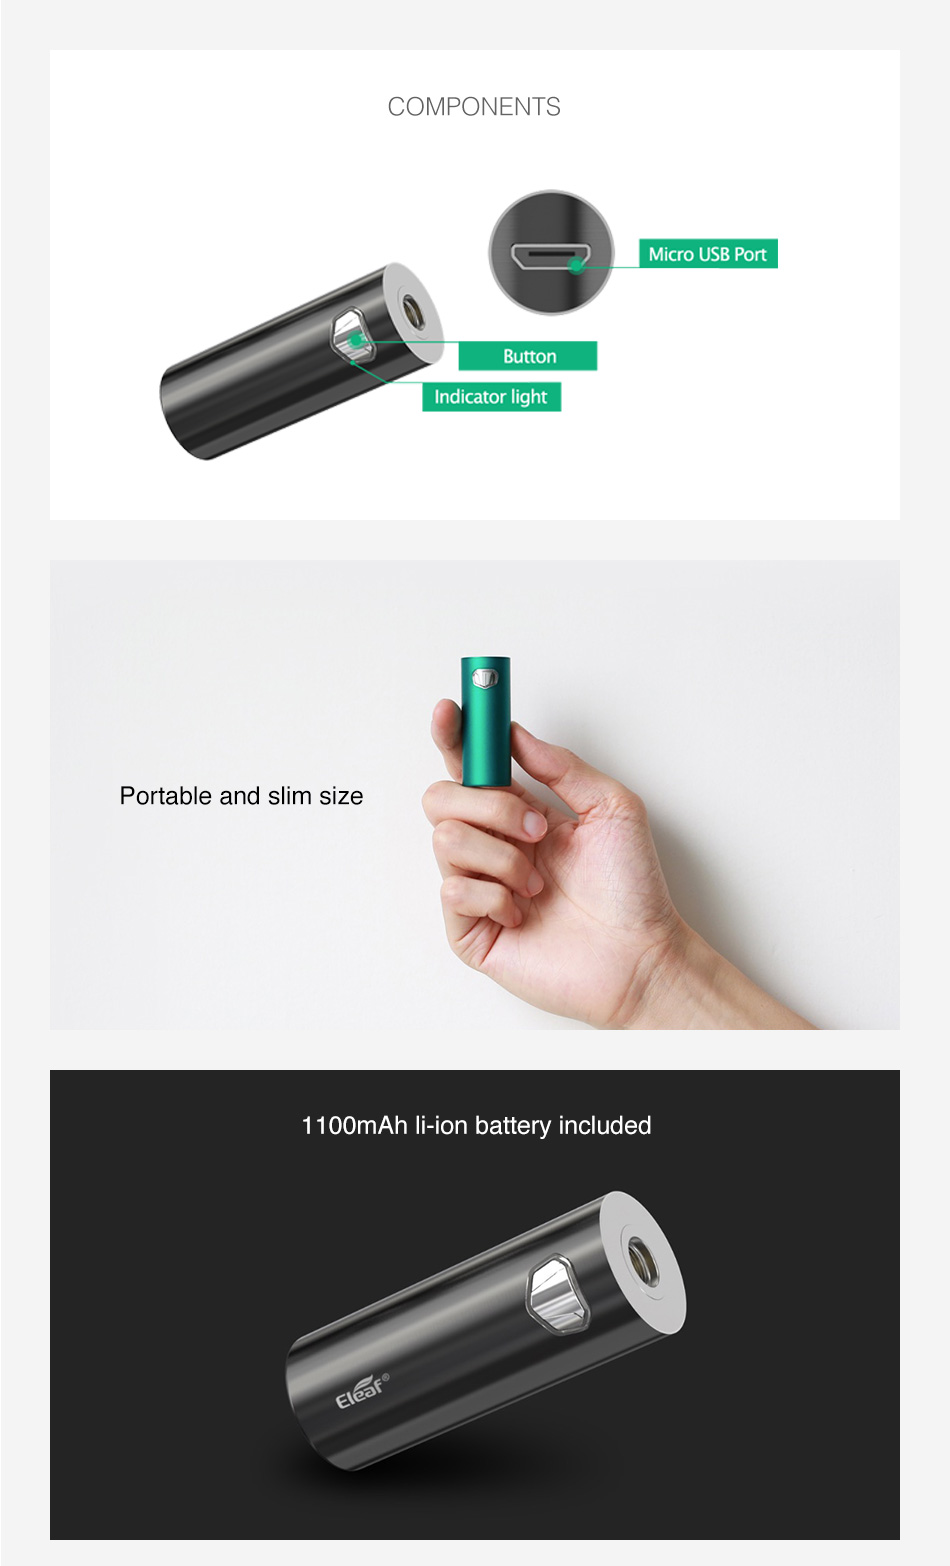 Batterie iJust Mini Eleaf